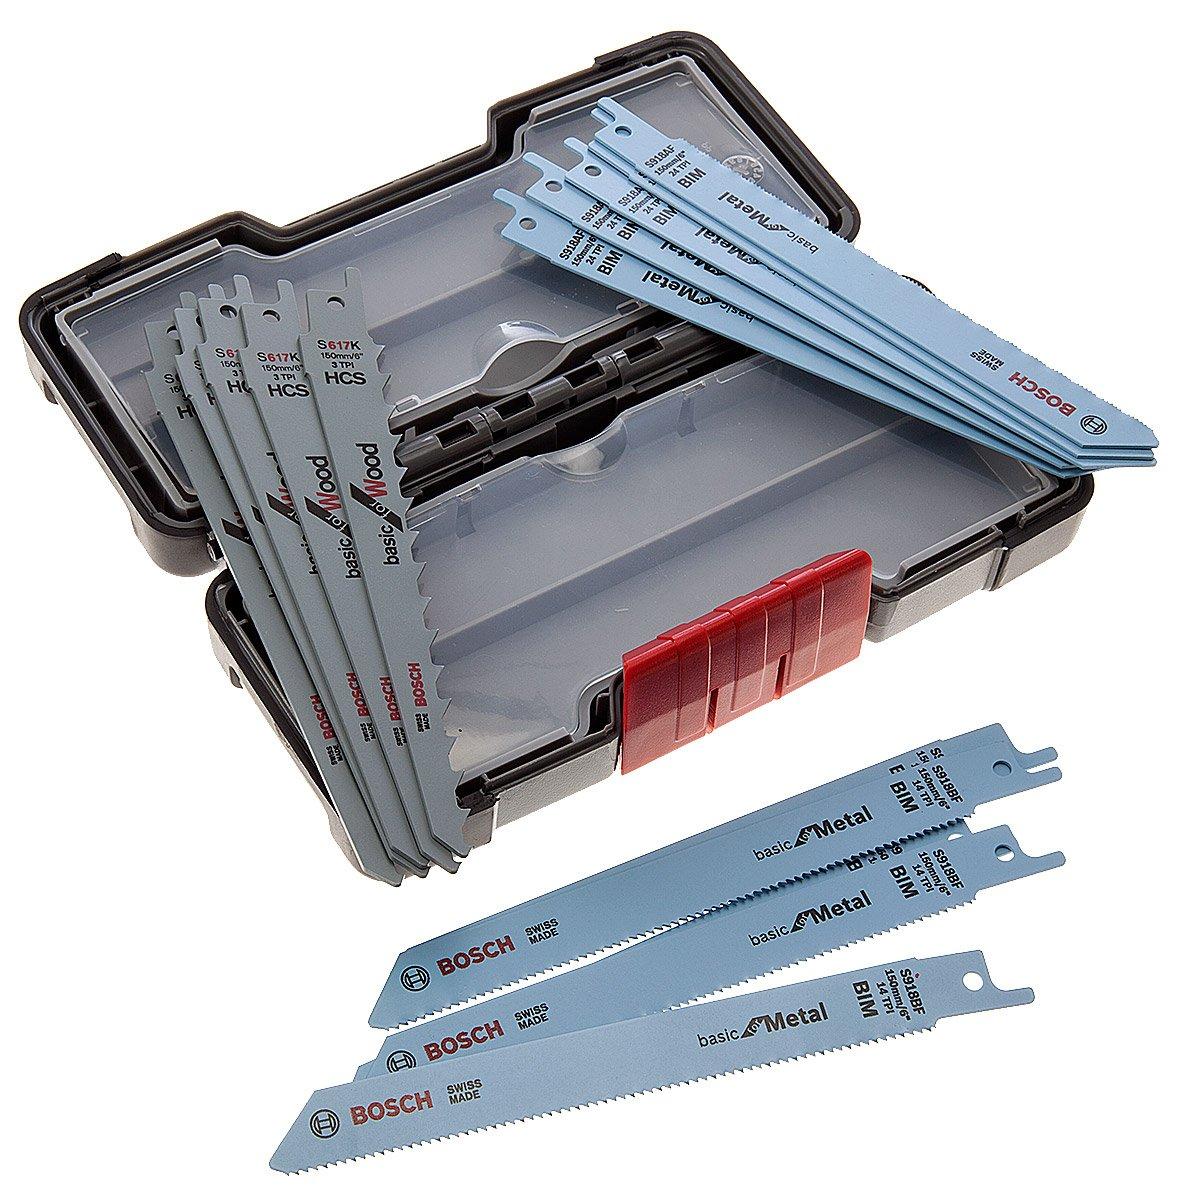 Bosch Professional 2607010901 Professional Sä belsä geblatt Set, 1 V, schwarz, 15 Stü ck